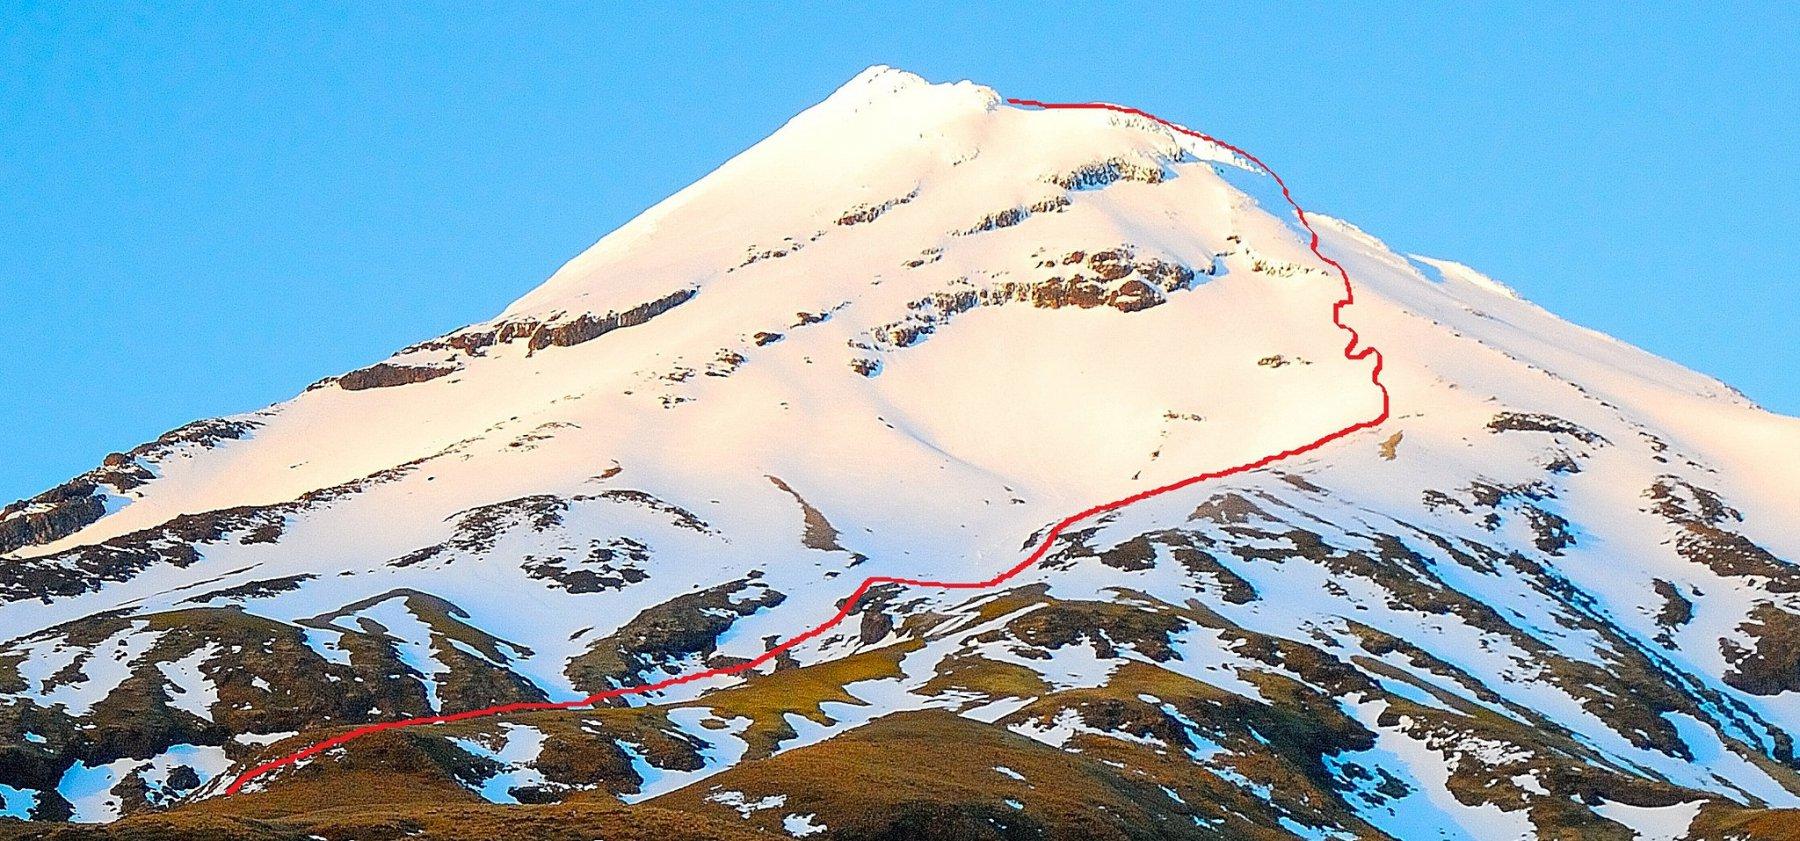 Egmont (Mount) o Taranaki itinerari vari 2014-10-11